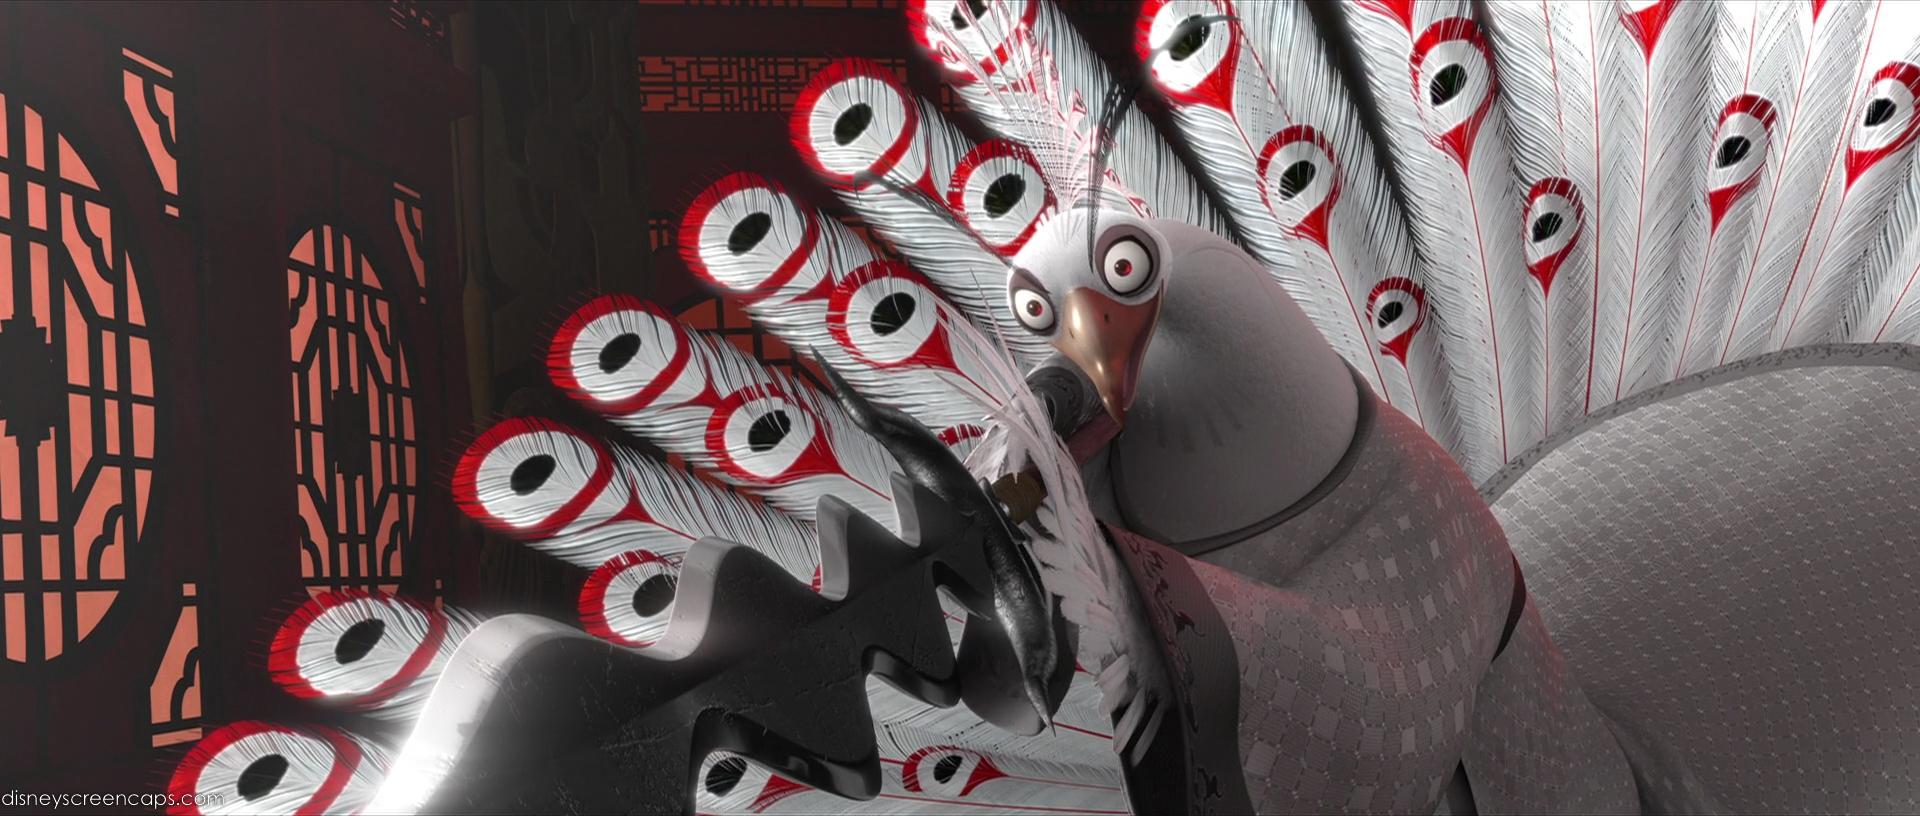 Villain Vignettes 20 Lord Shen Rotoscopers